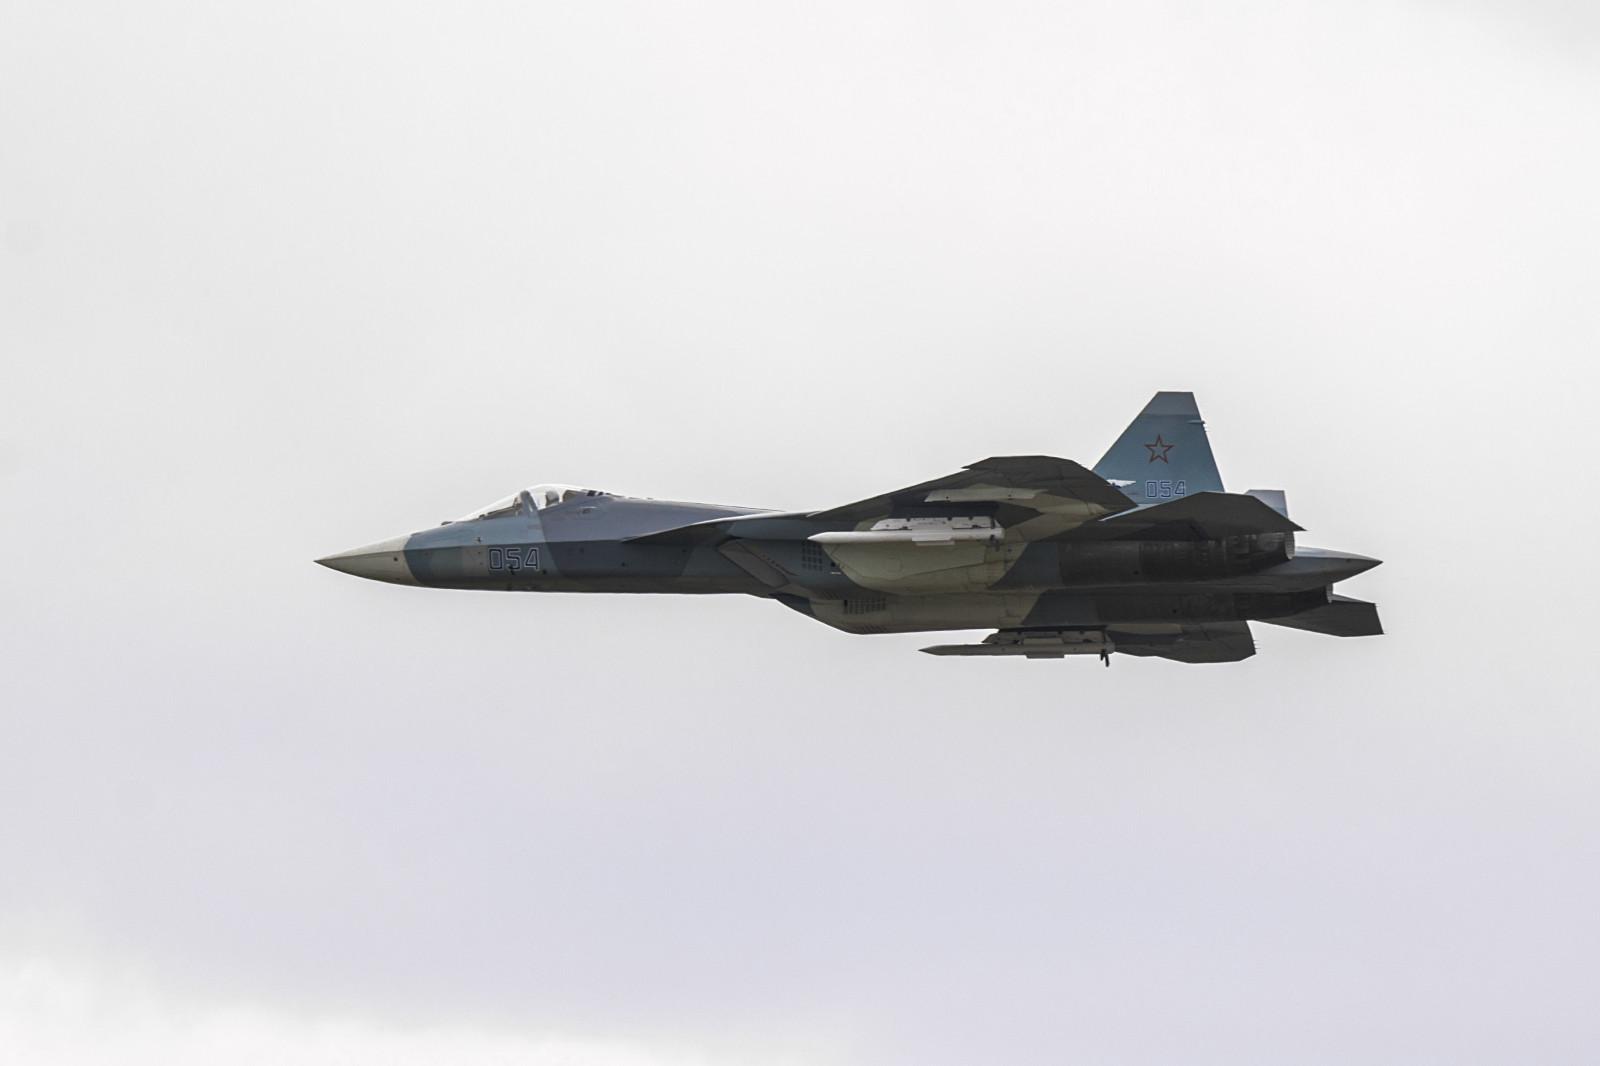 Wallpaper : vehicle, airplane, military aircraft, Lockheed Martin F